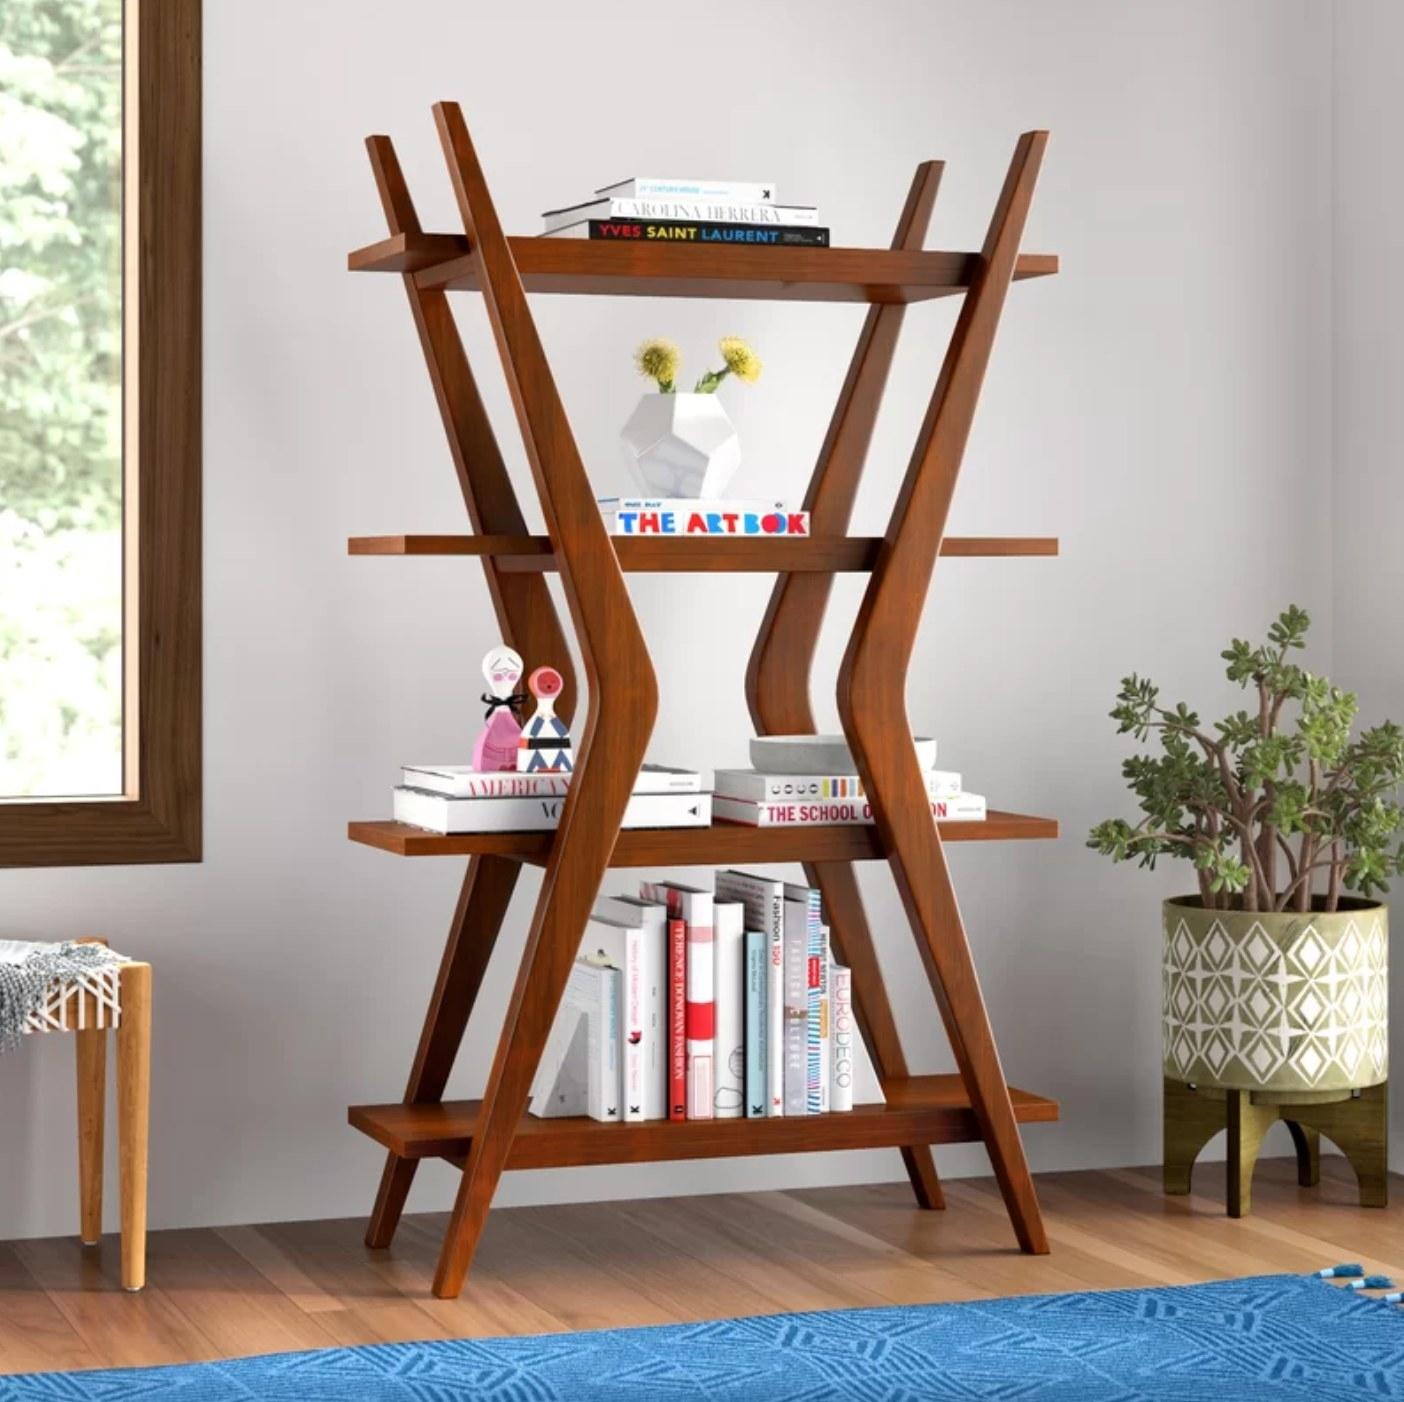 The geometric bookcase